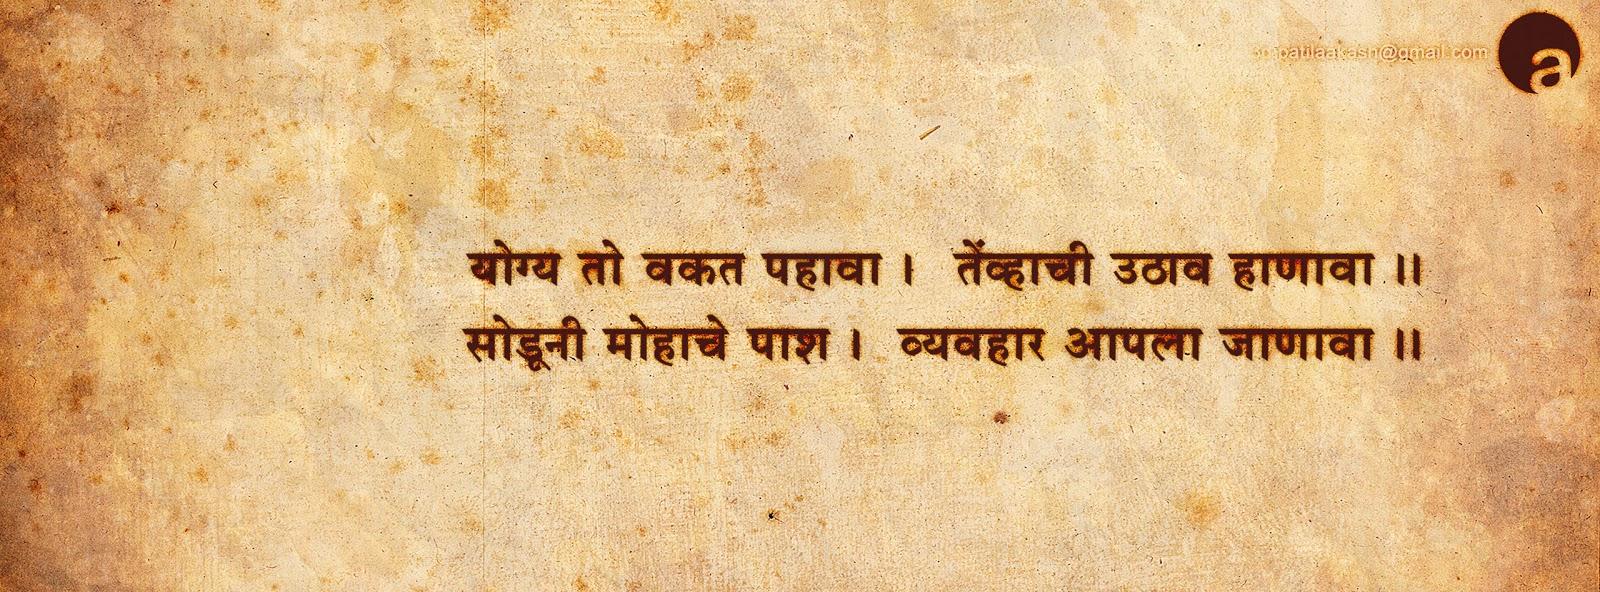 Marathi, calligraphy, old, sant, aakashpatil, mimarathiap